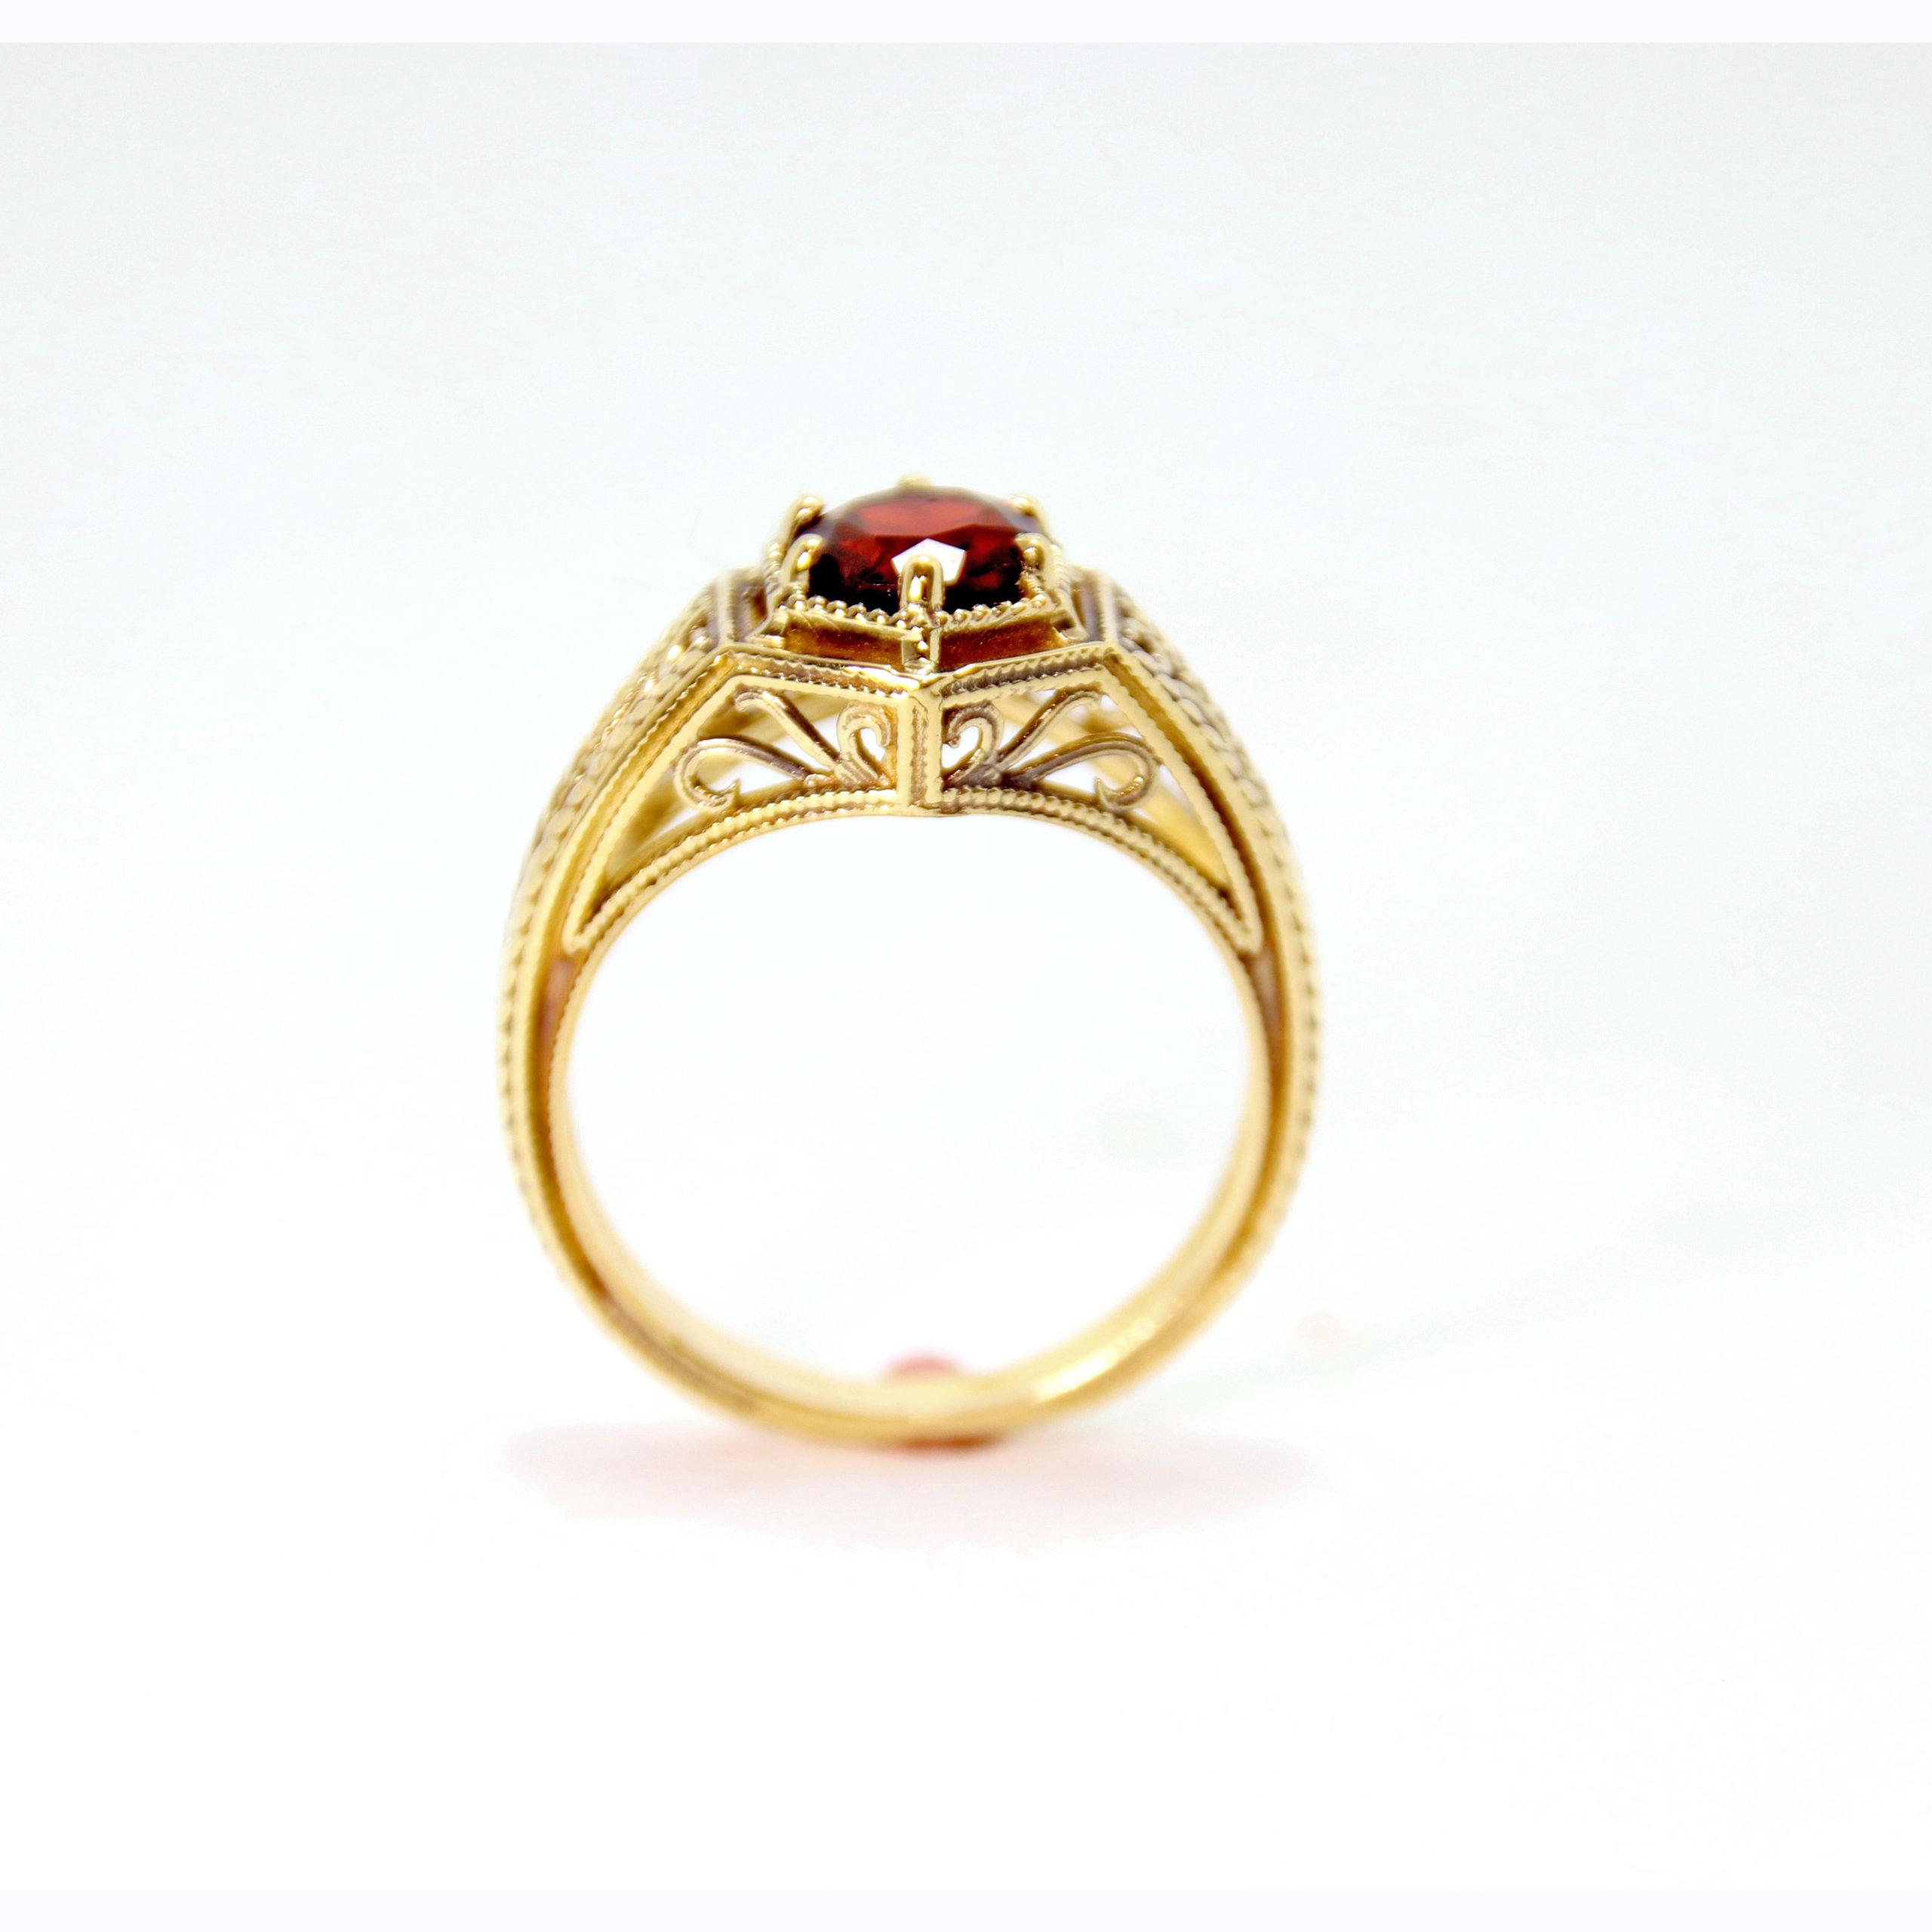 14k Yellow Gold Garnet Ring 2 - Baltinester Jewelry